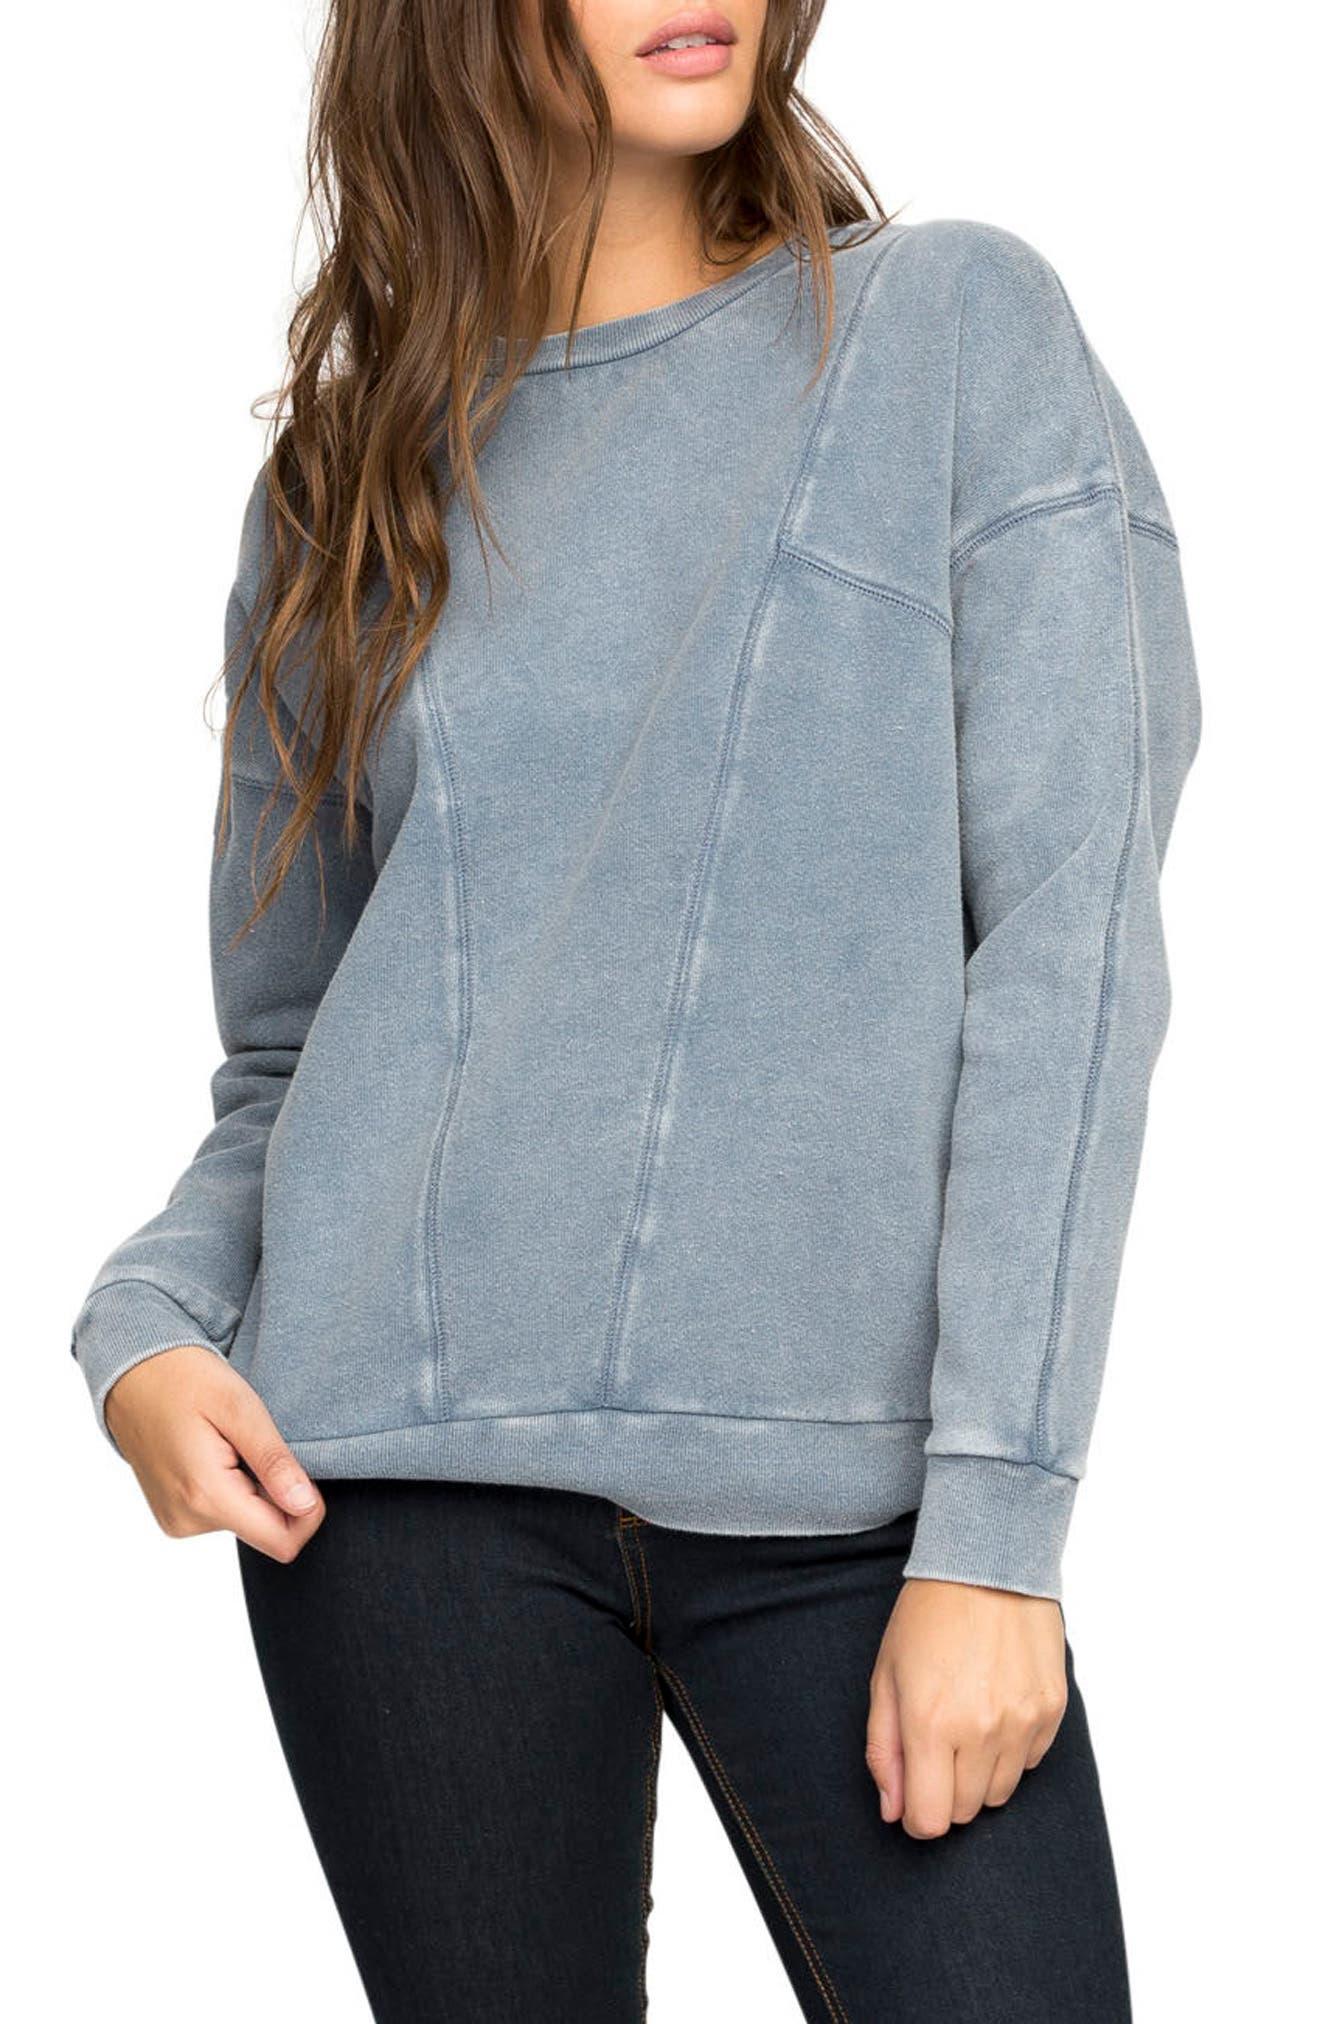 Take Care Sweatshirt,                         Main,                         color, Navy